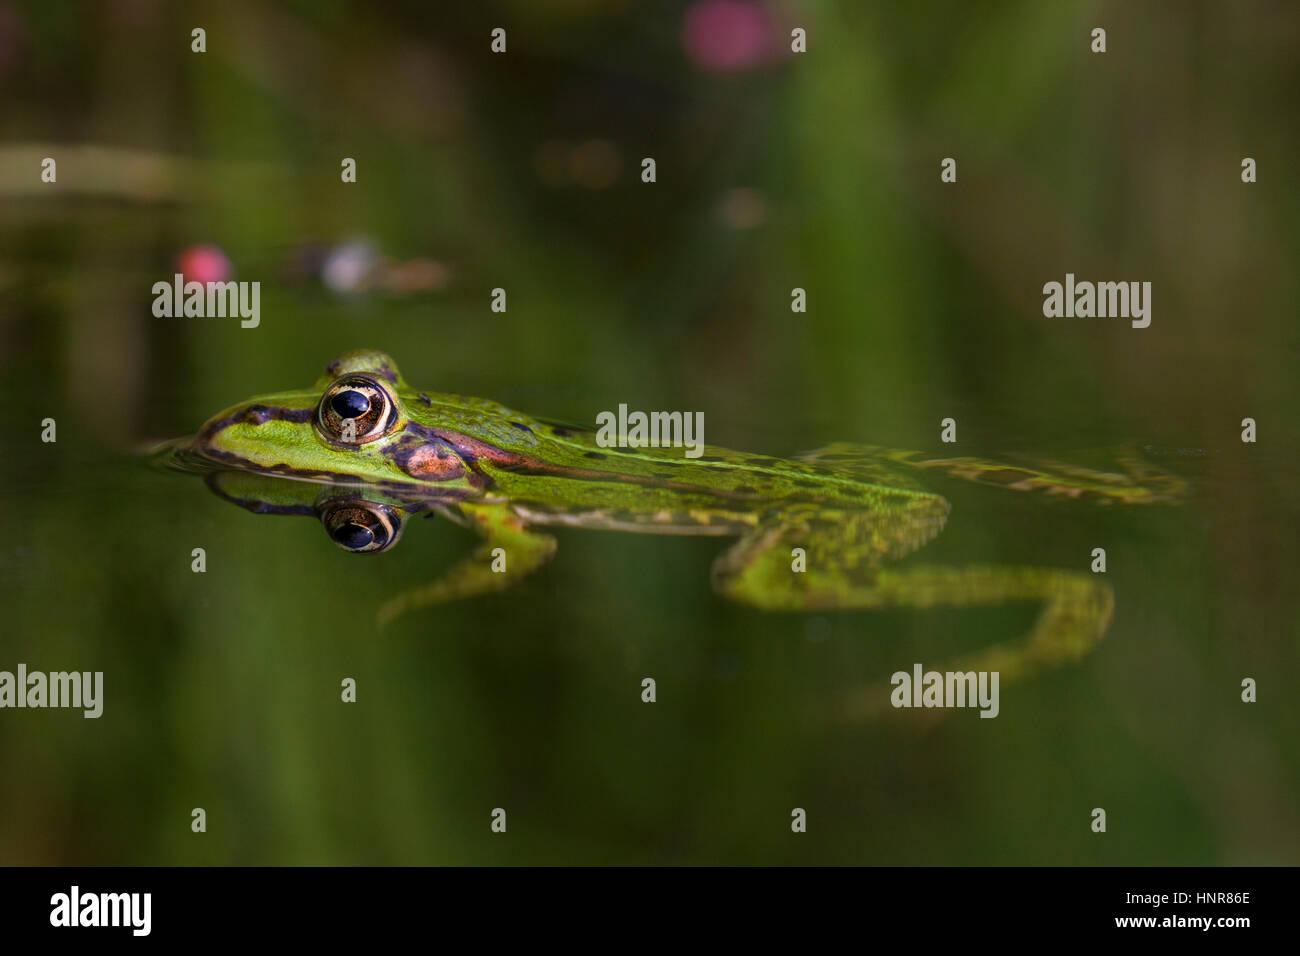 Edible frog / common water frog / green frog (Pelophylax kl. esculentus / Rana kl. esculenta) floating in water - Stock Image